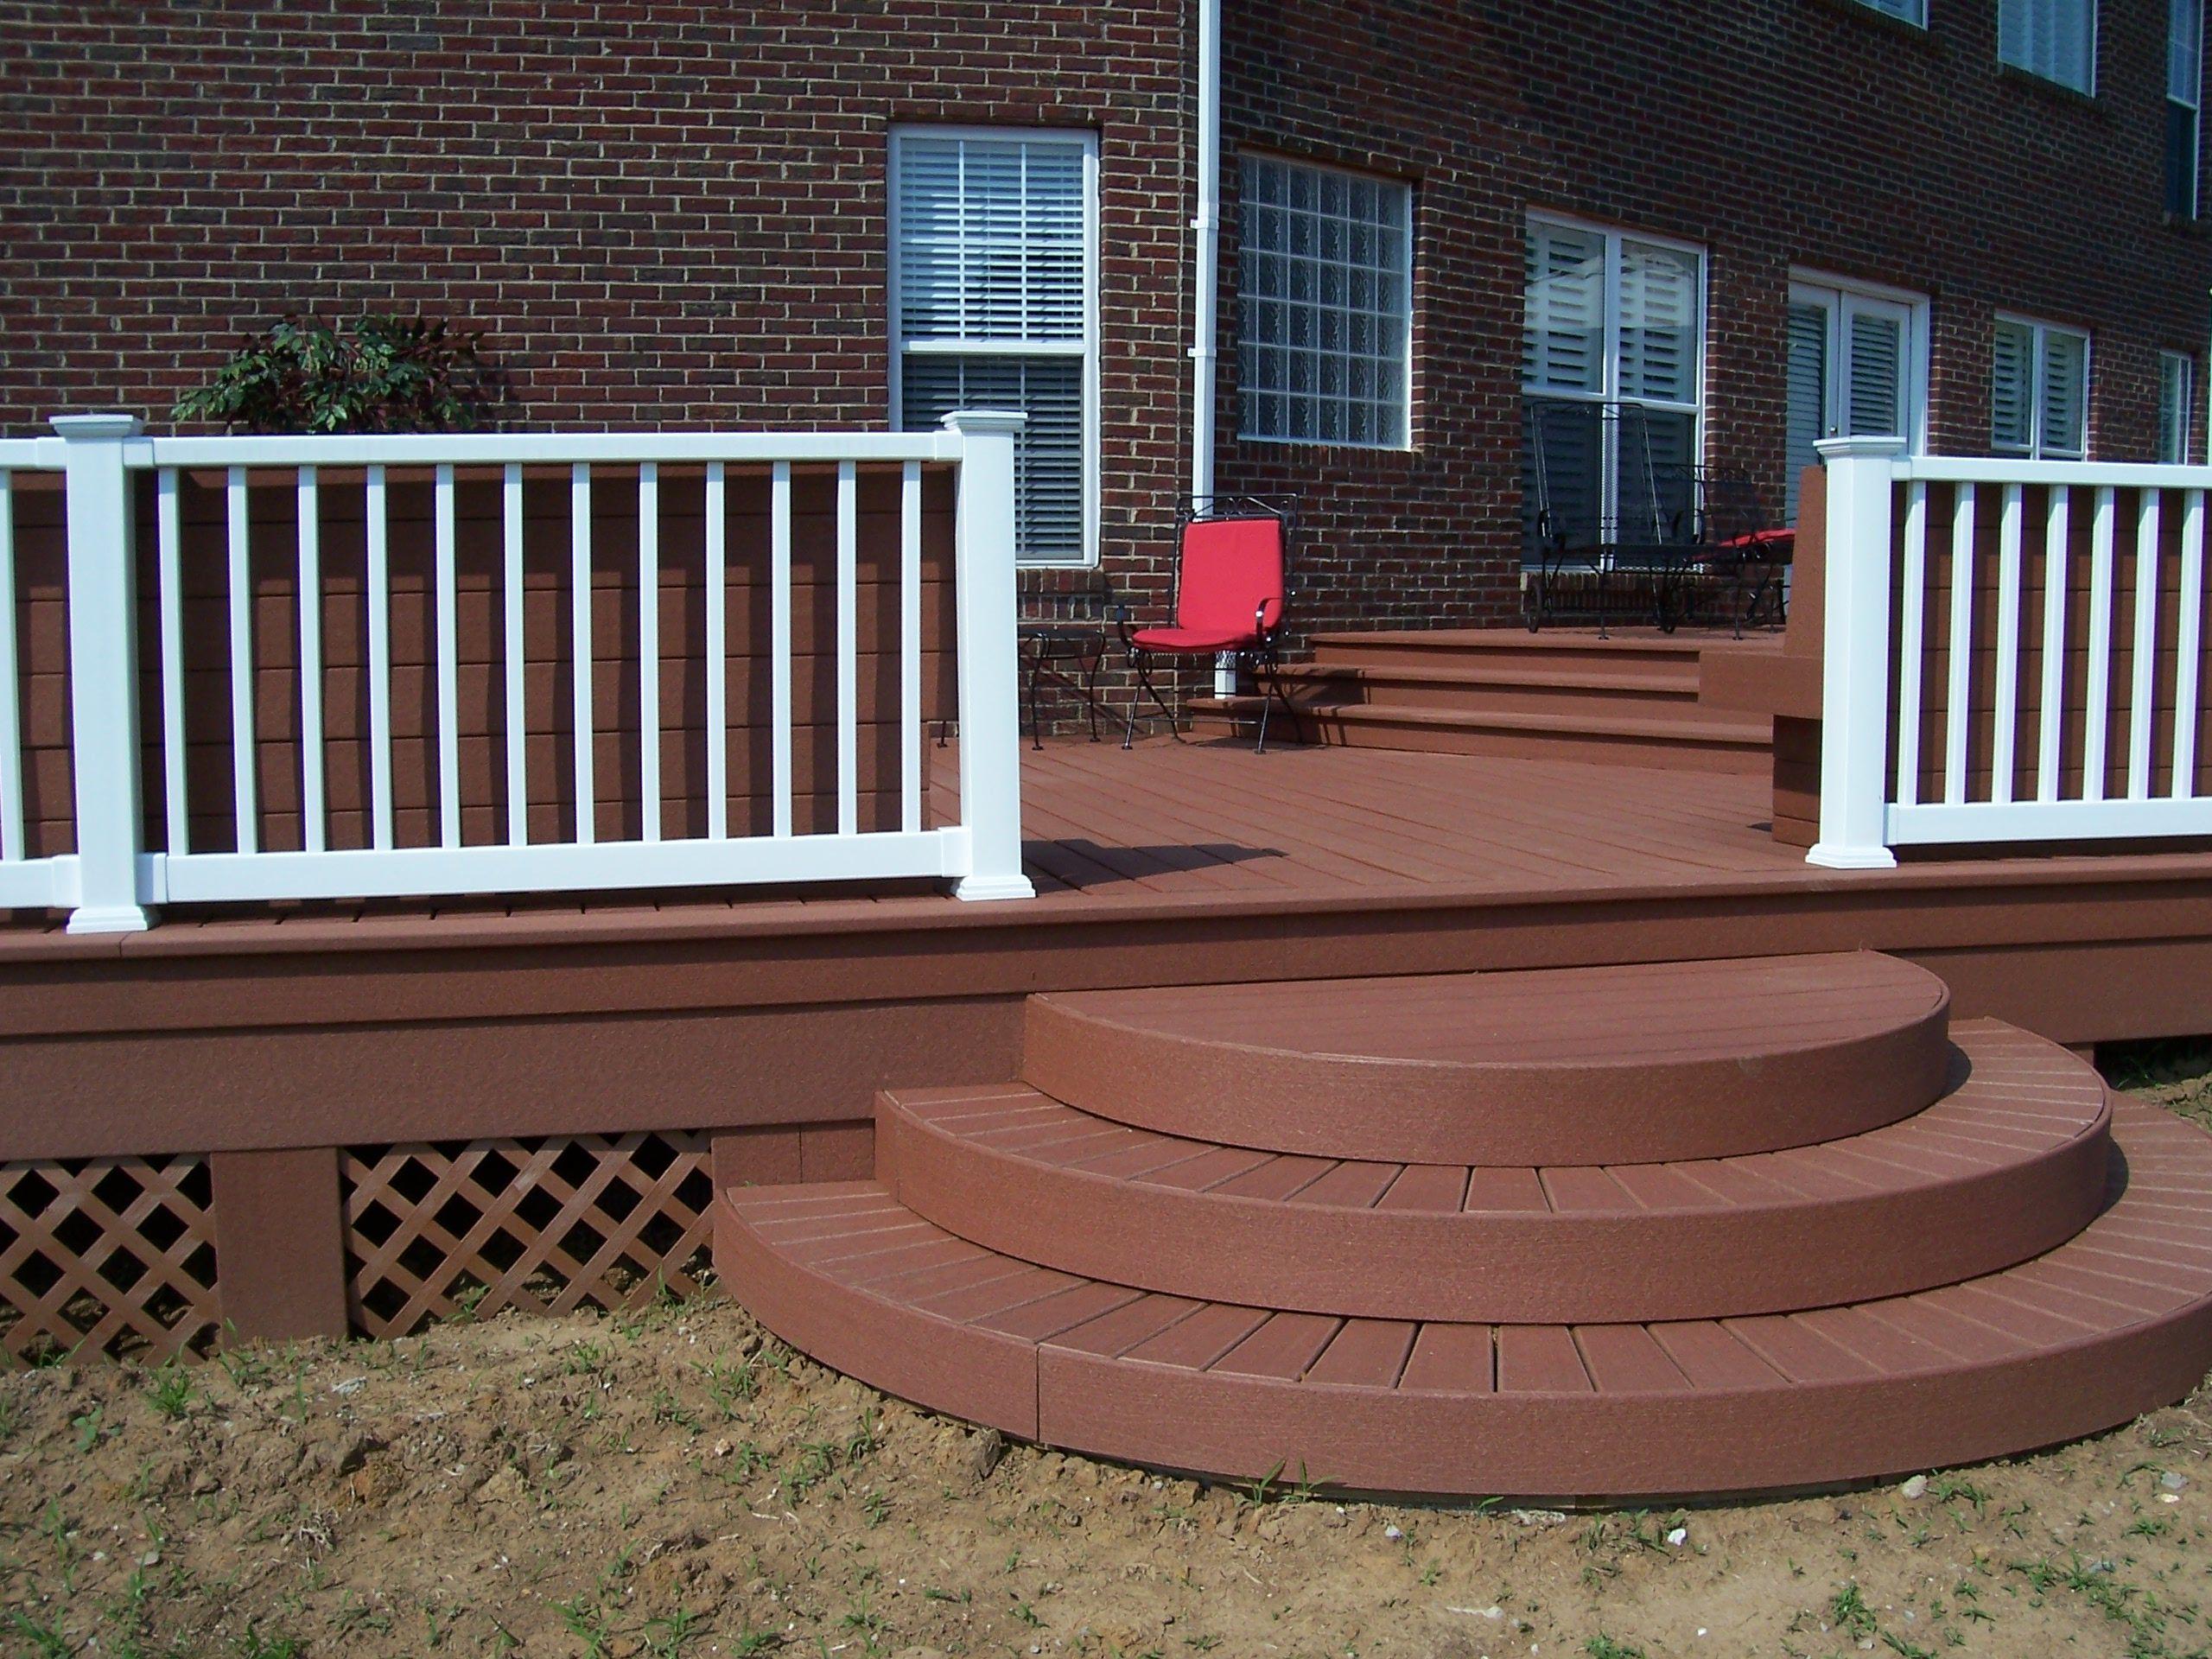 Best Circular Steps Composite Decks Composite Decking Deck 640 x 480